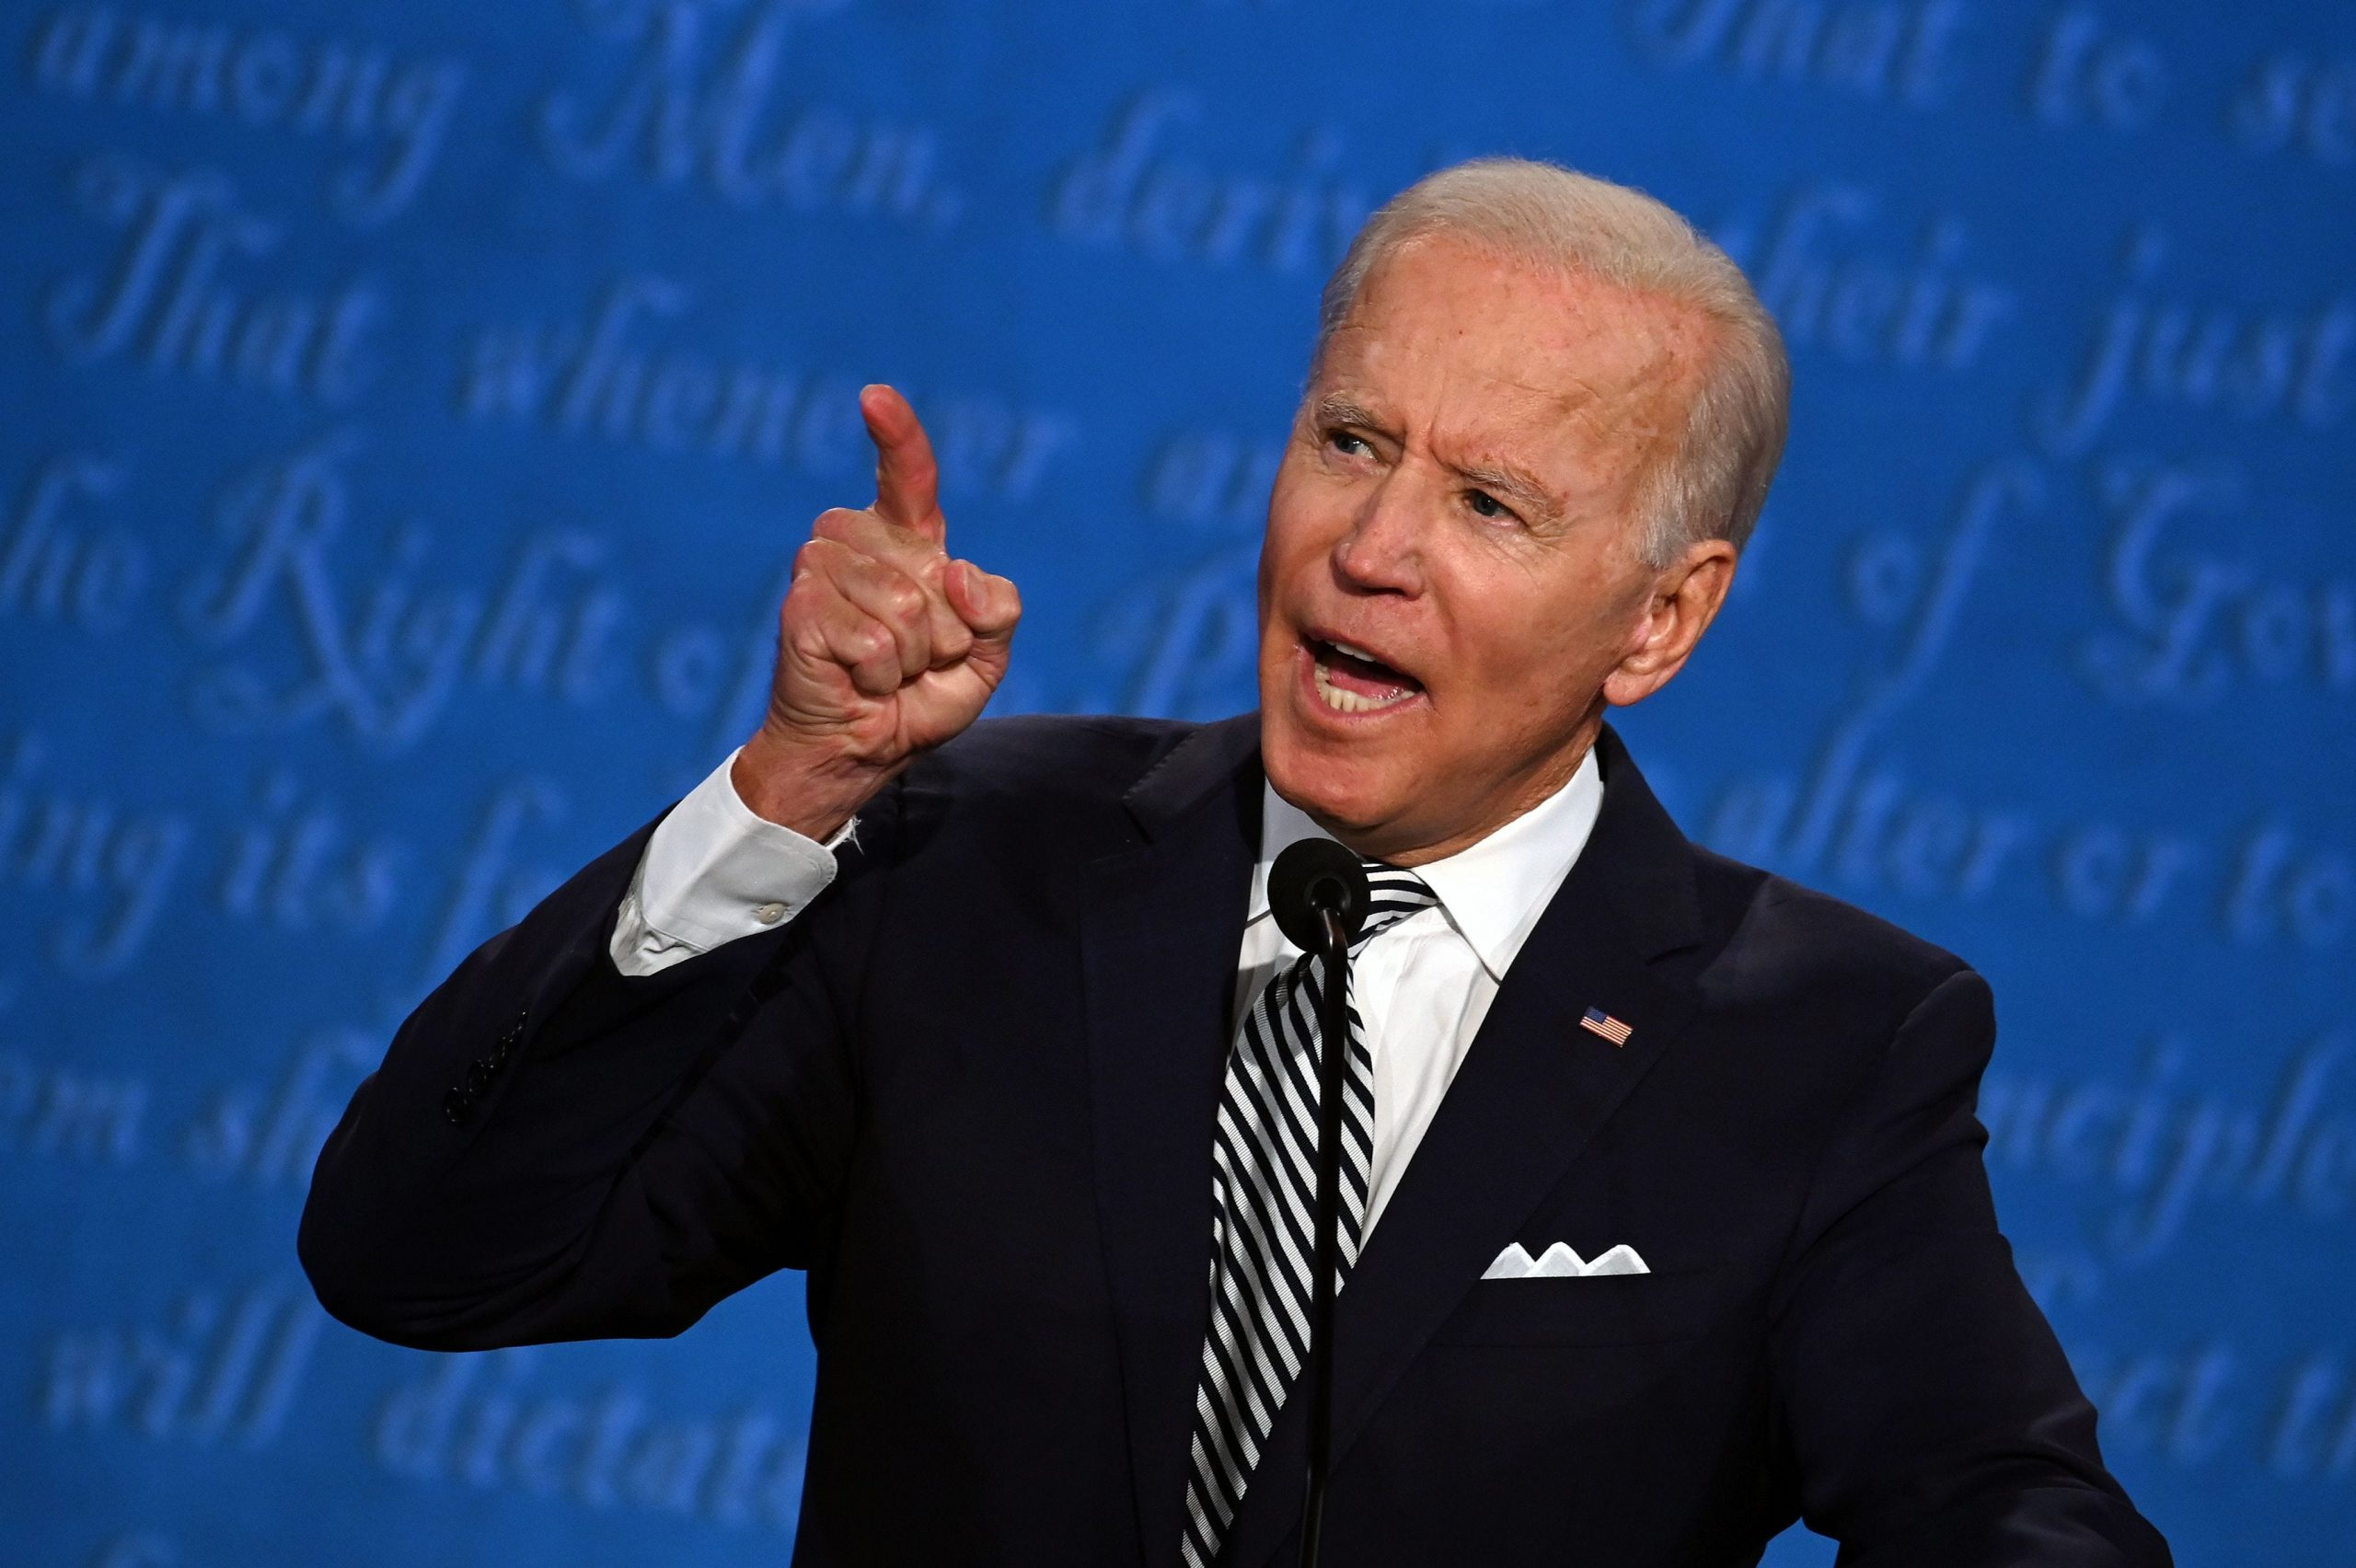 Joe Biden during the first U.S. presidential debate. Photo: StratosBril/Shutterstock